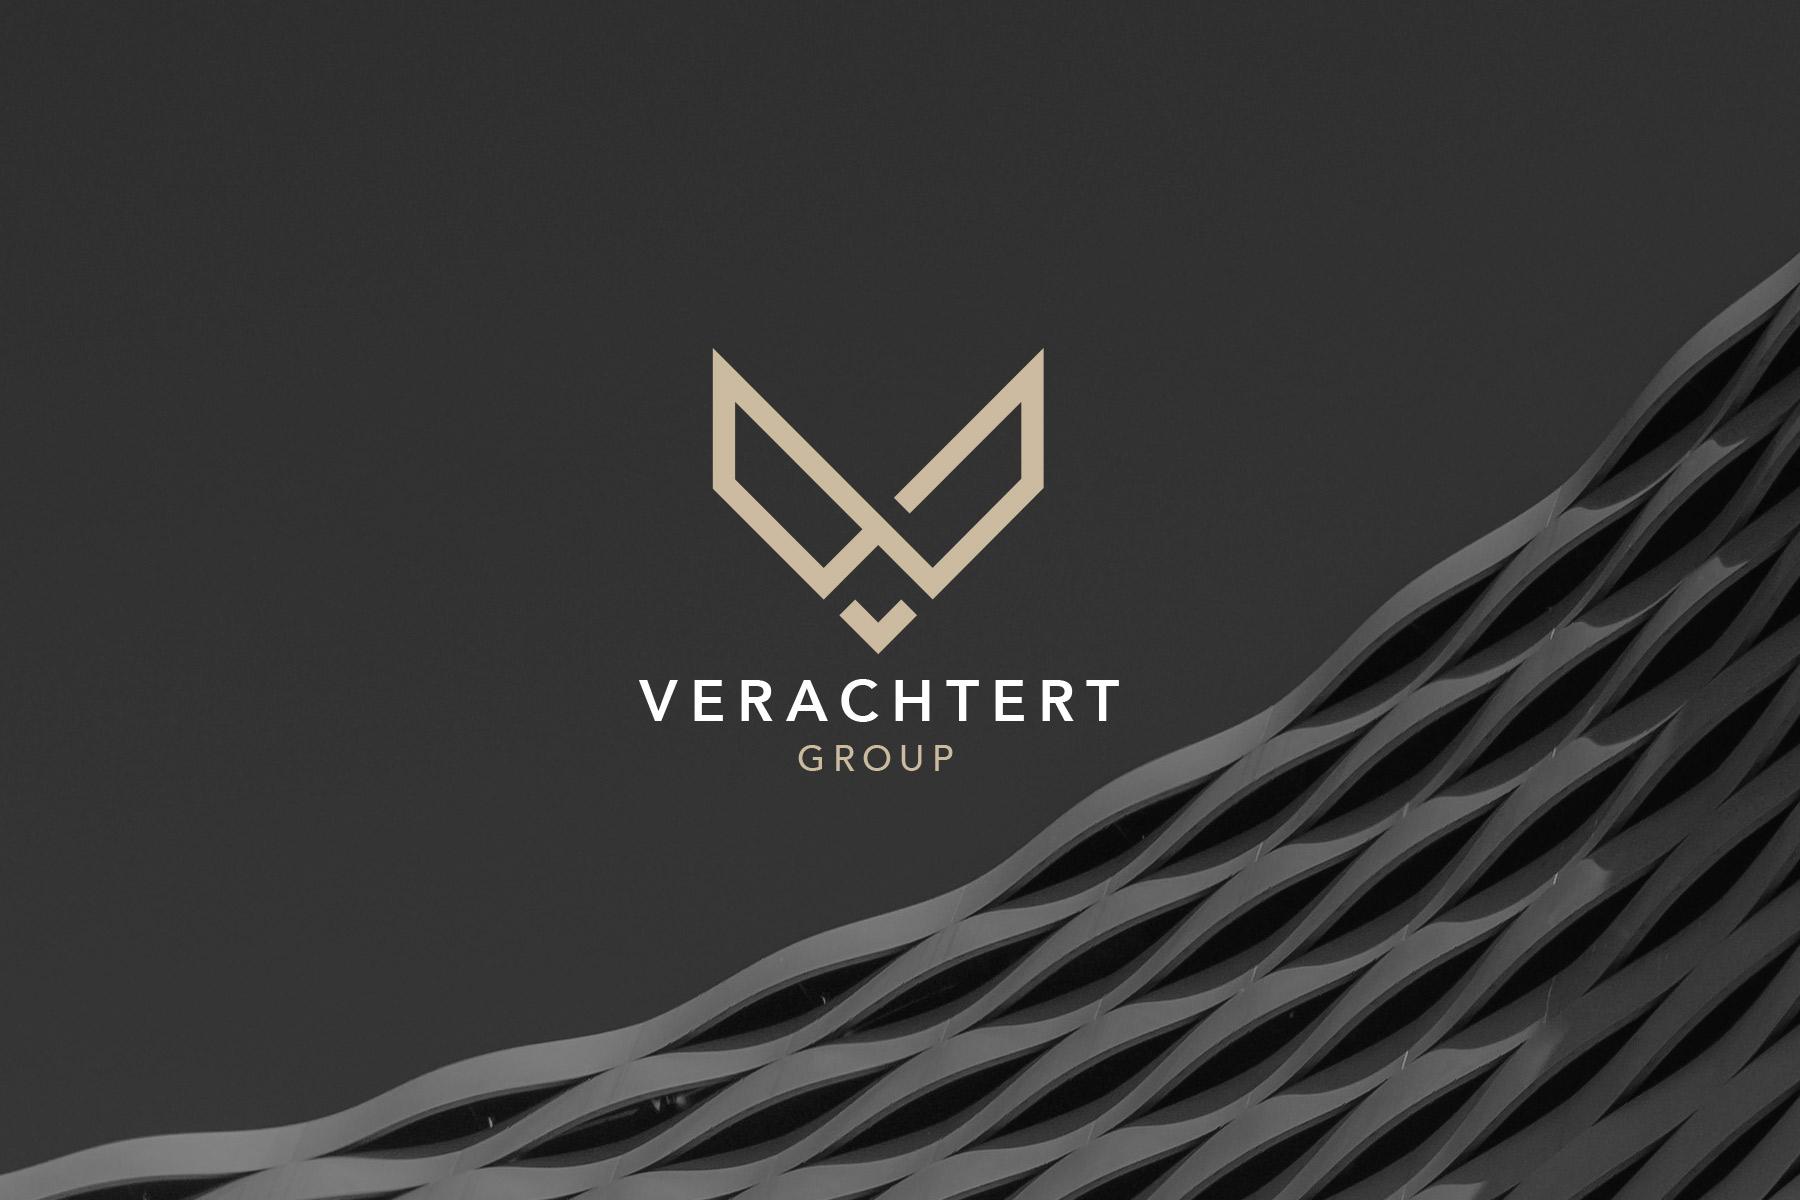 verachtert-group-logo